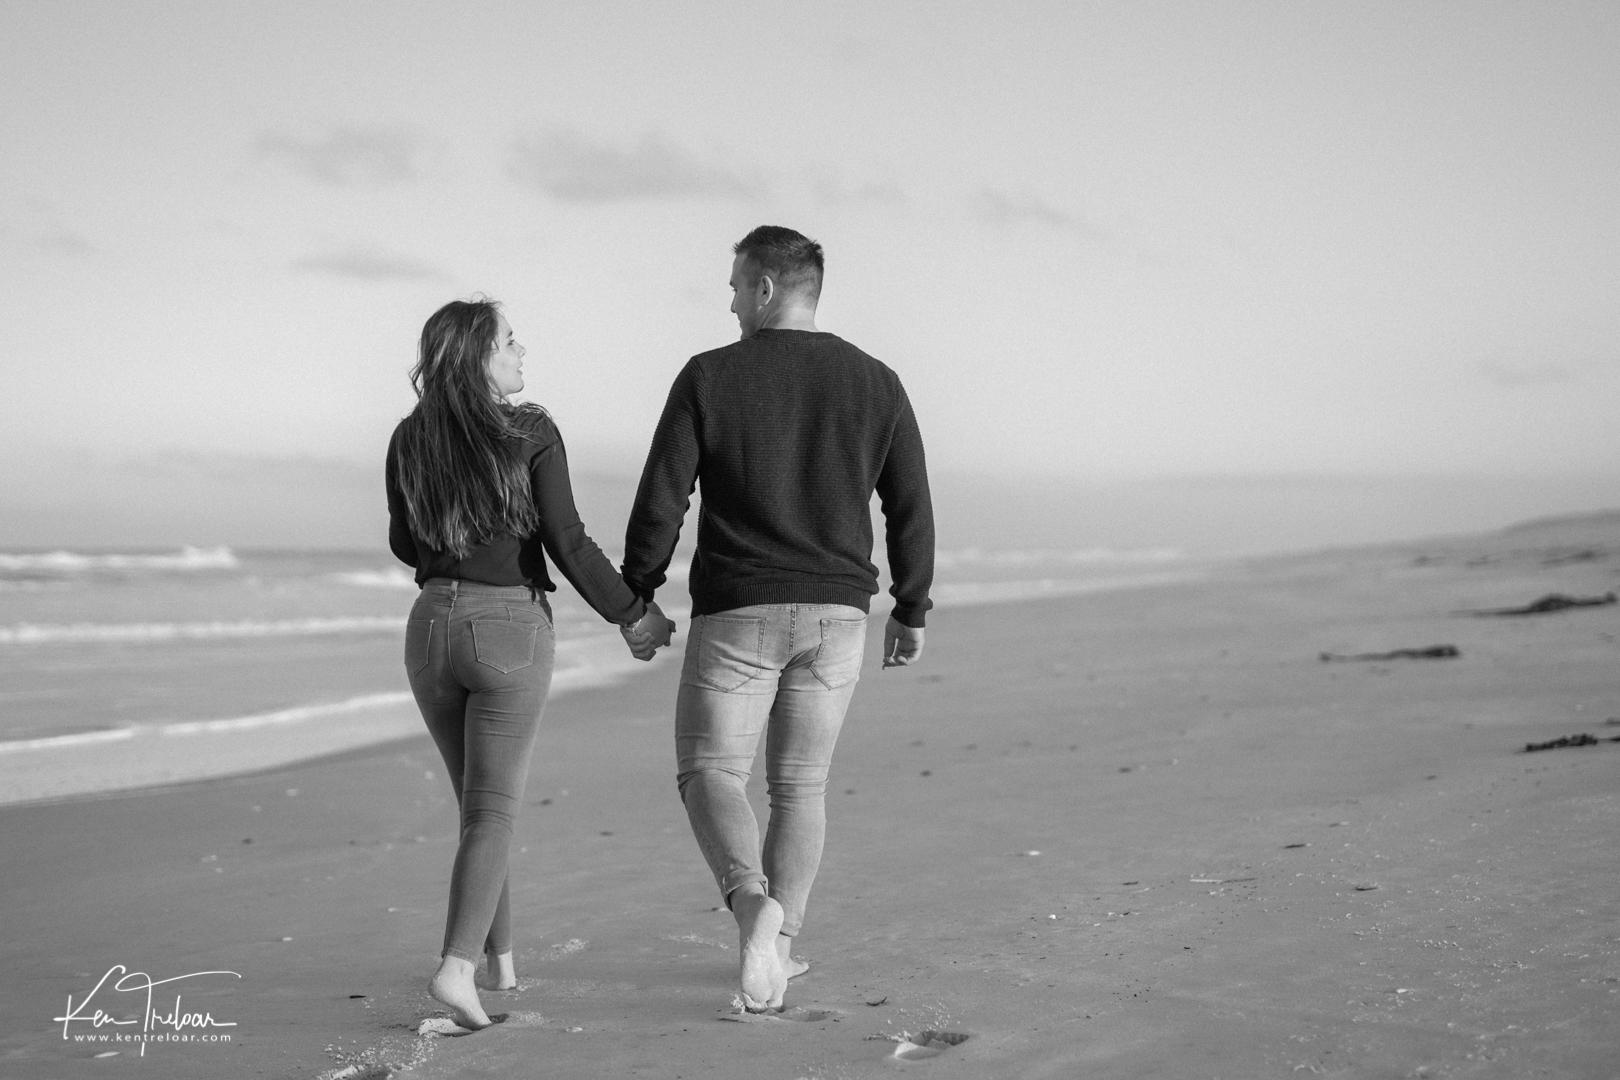 Ken Treloar - Romantic Couples photoshoot Cape Town 2019-22.jpg